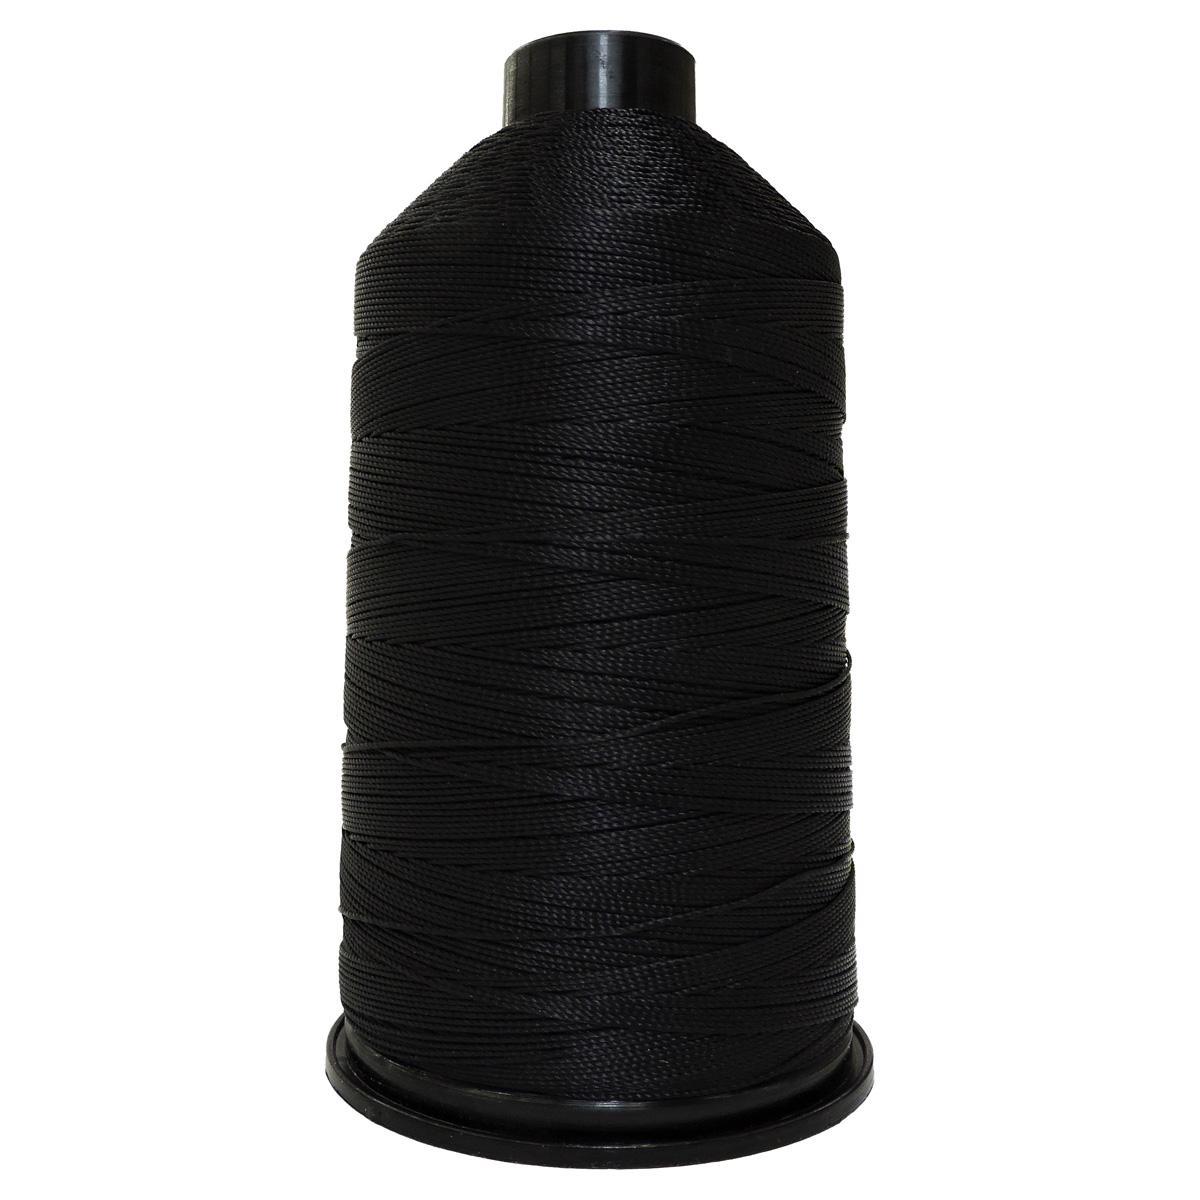 #277 Sewing Machine Thread, Black